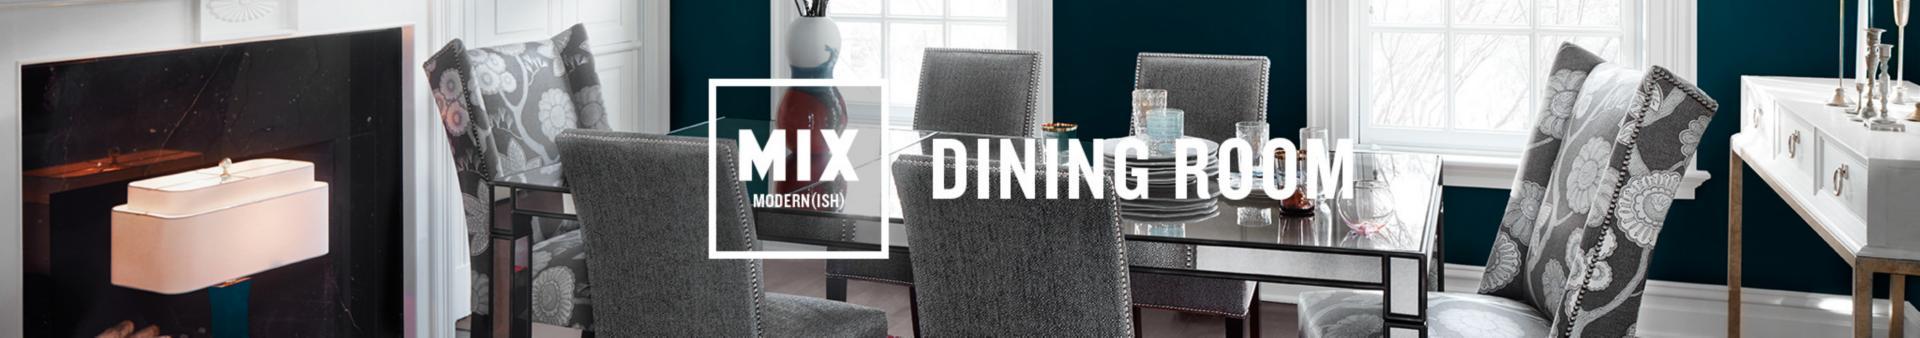 modernish dining room